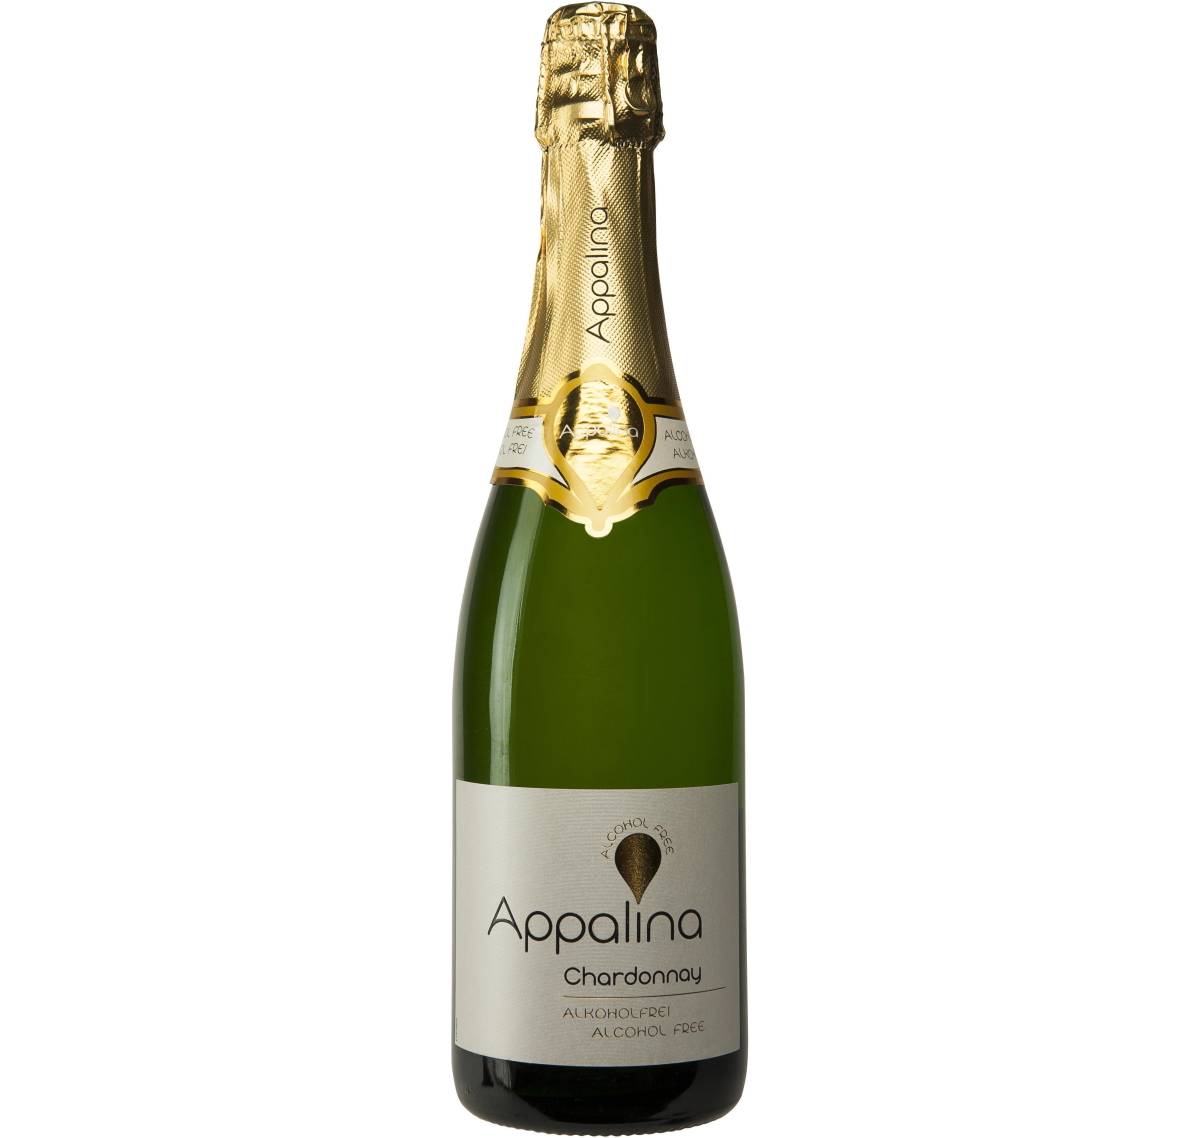 Appalina Chardonnay - Alcoholvrij